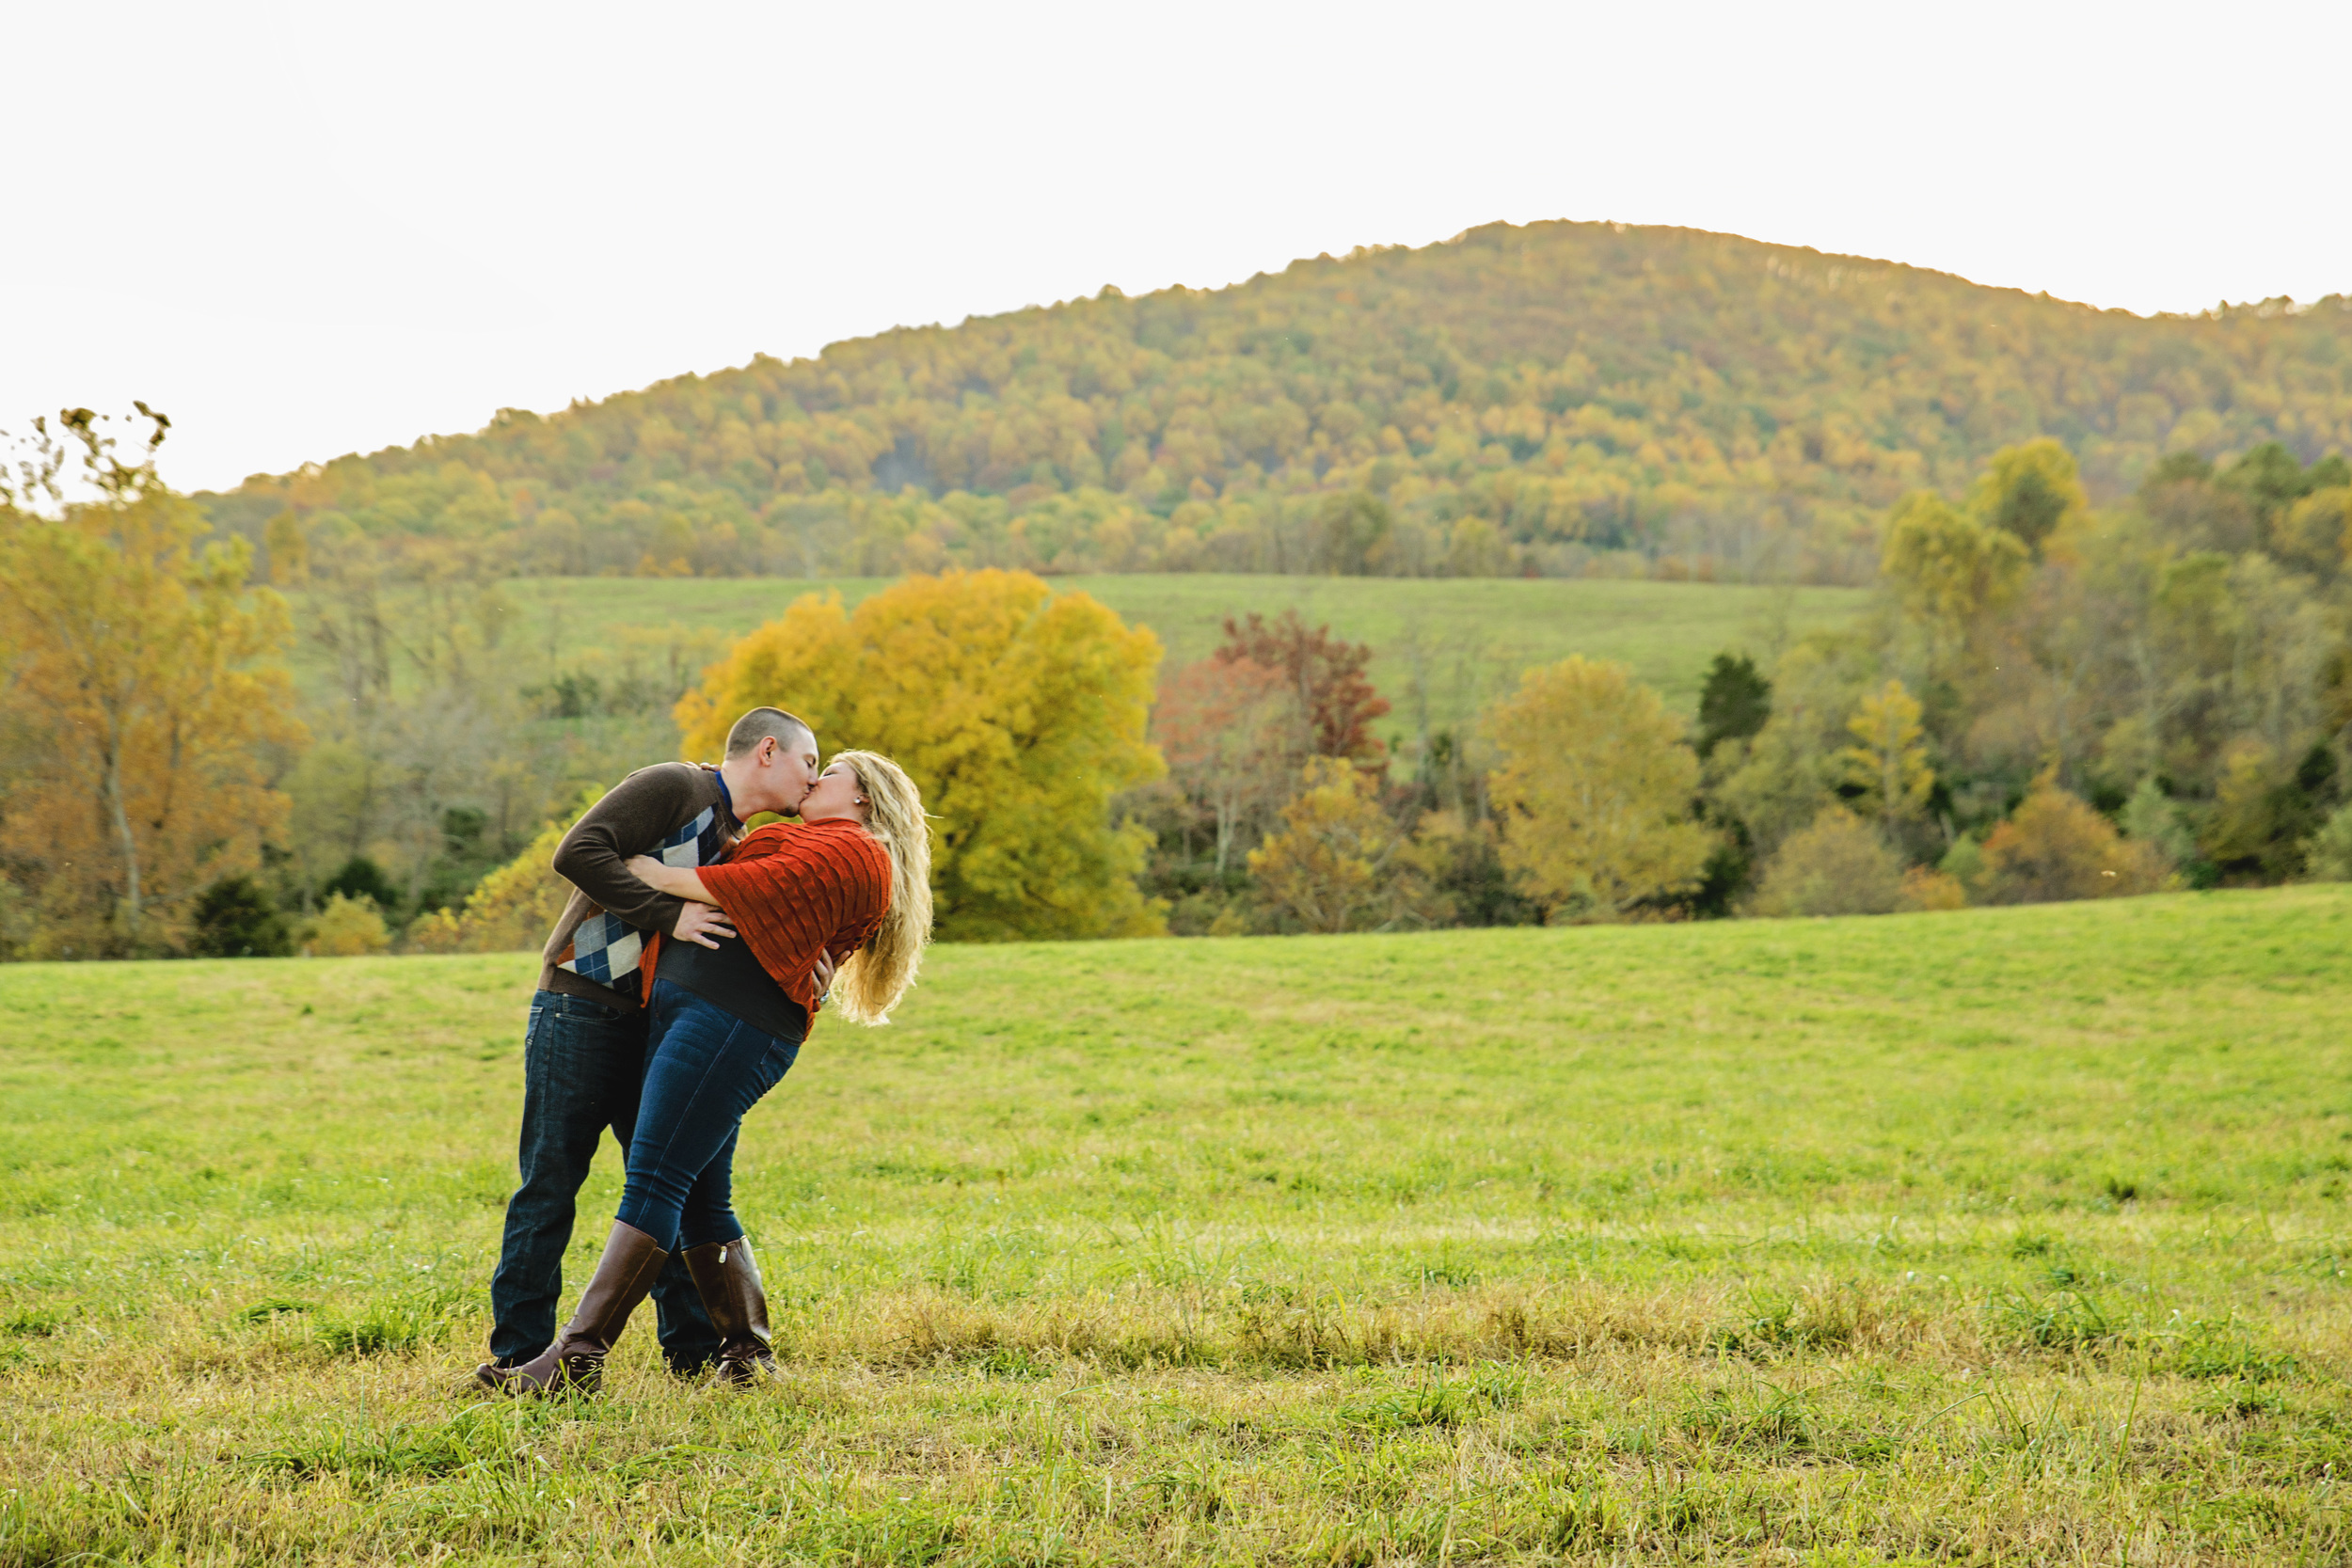 fall_romantic_orchard_engagement_session_lynchburg_va017.jpg